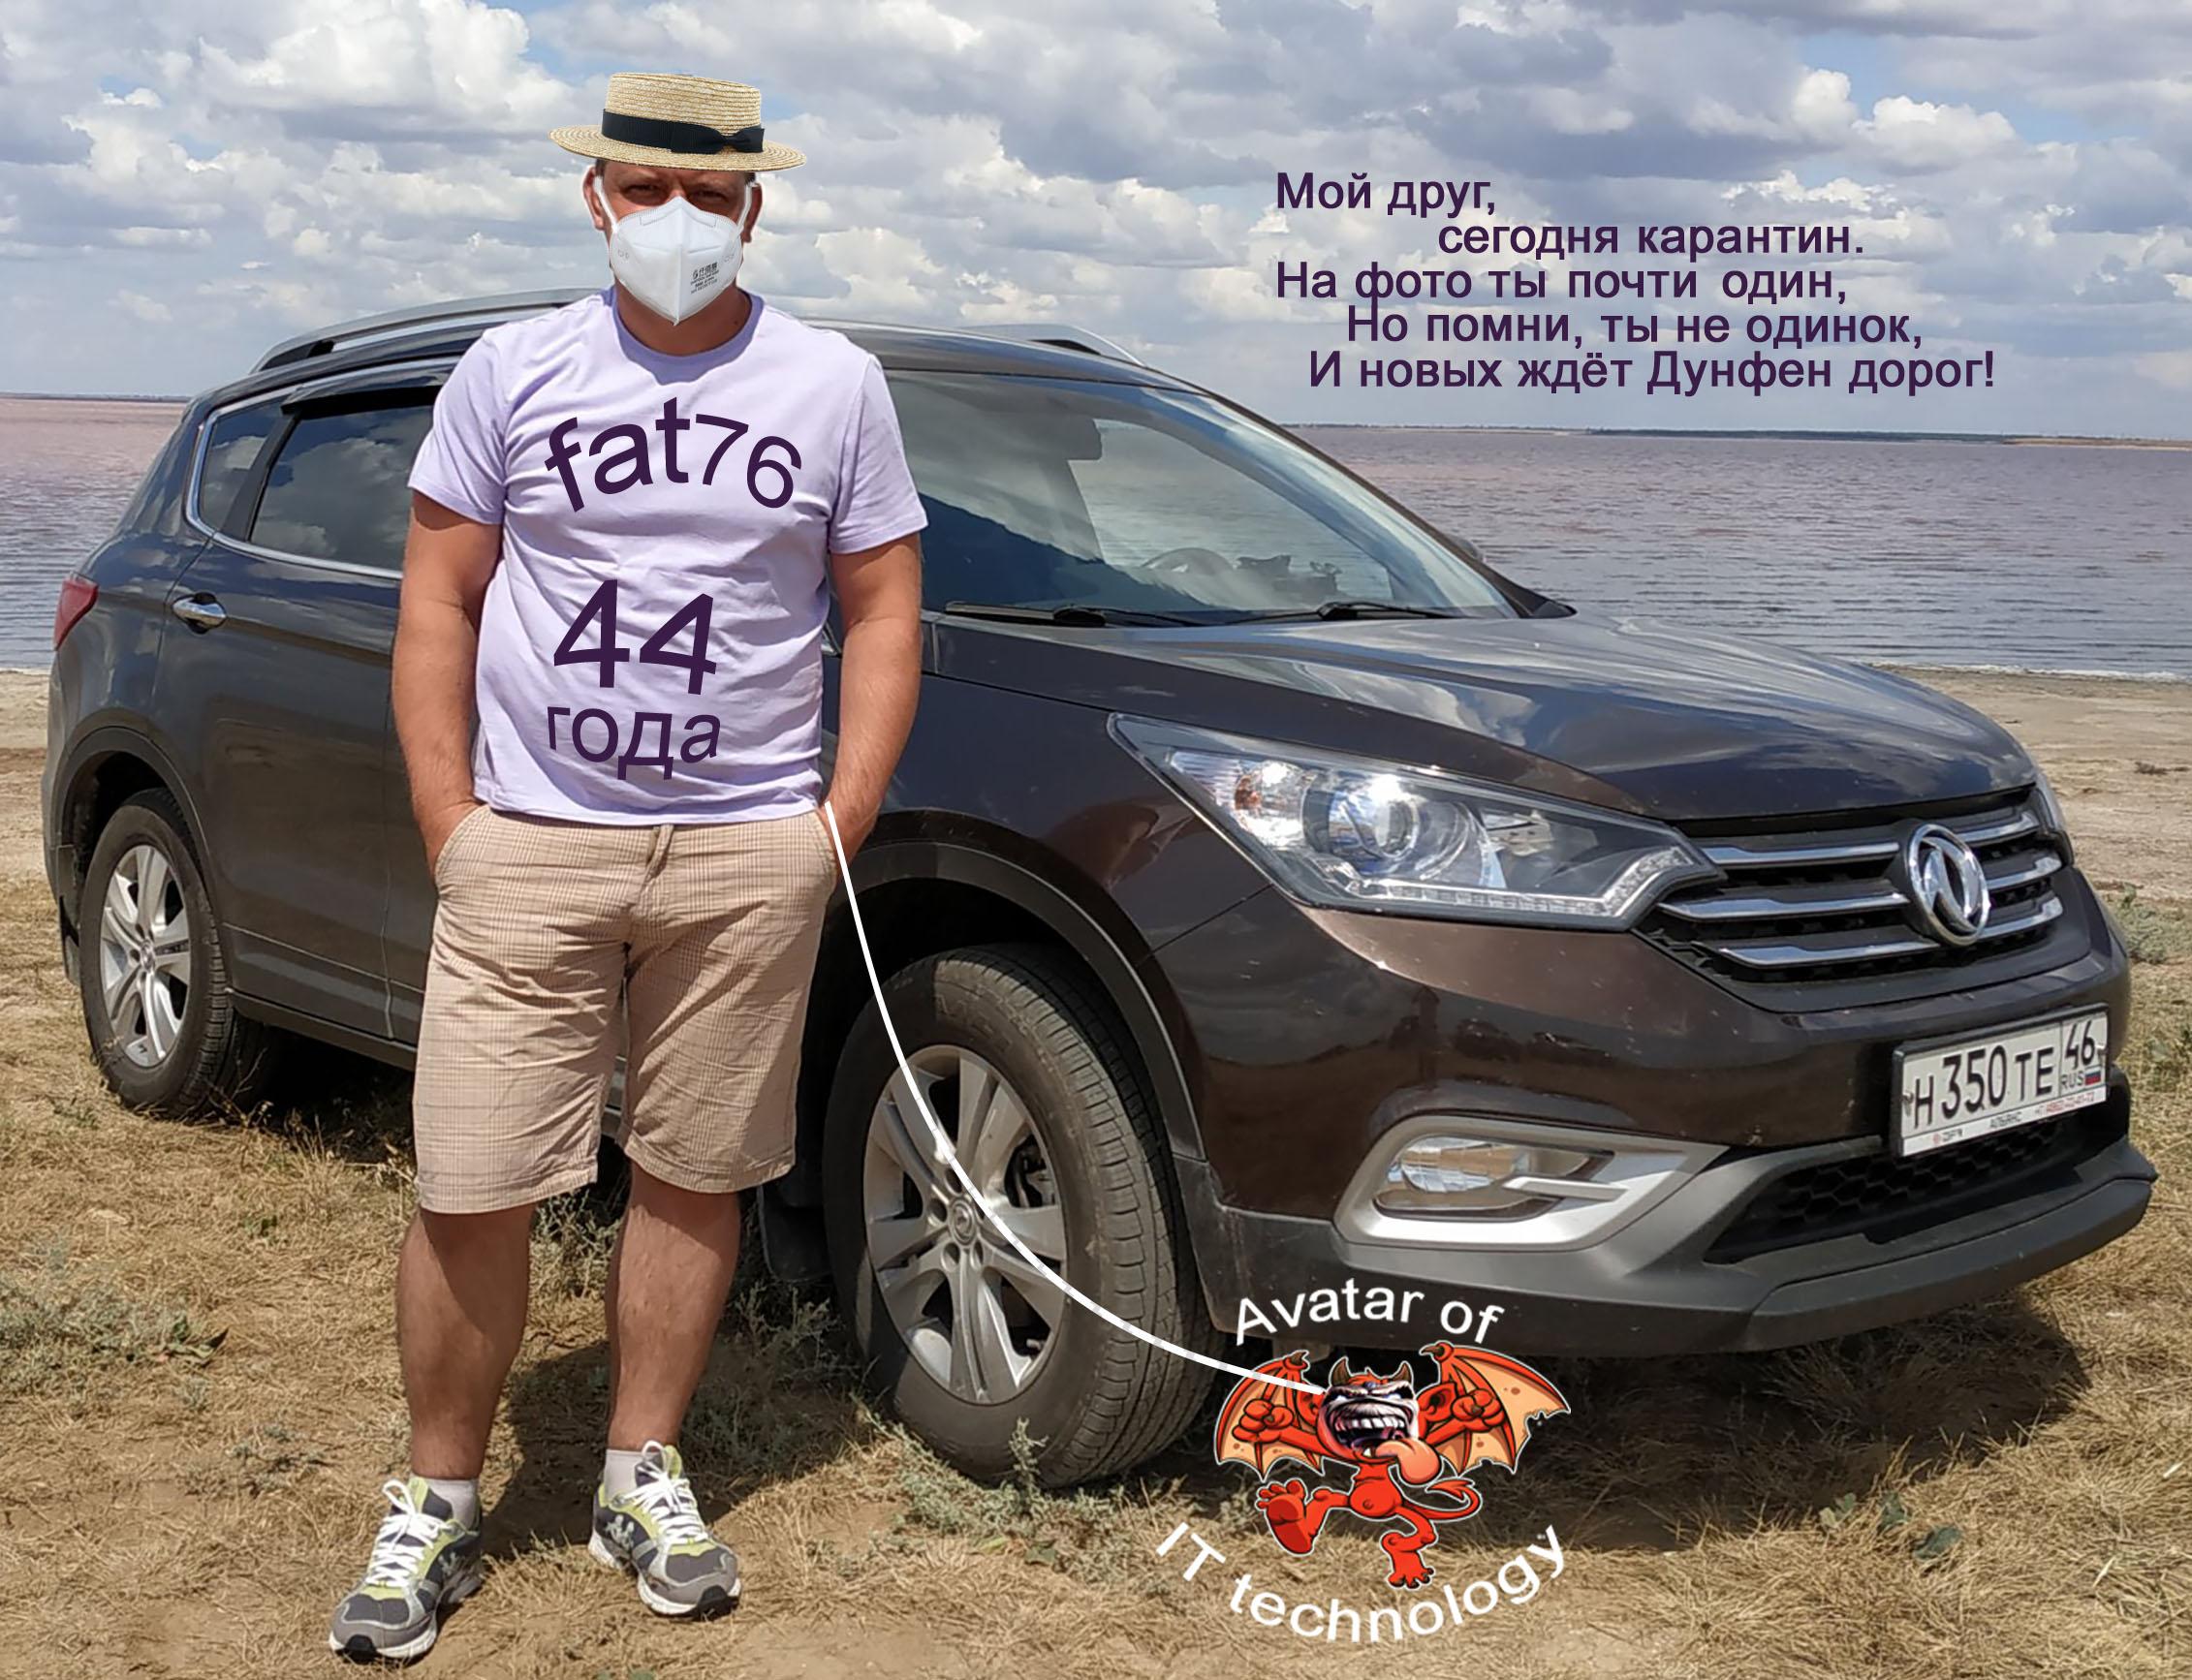 Евгений fat76.jpg